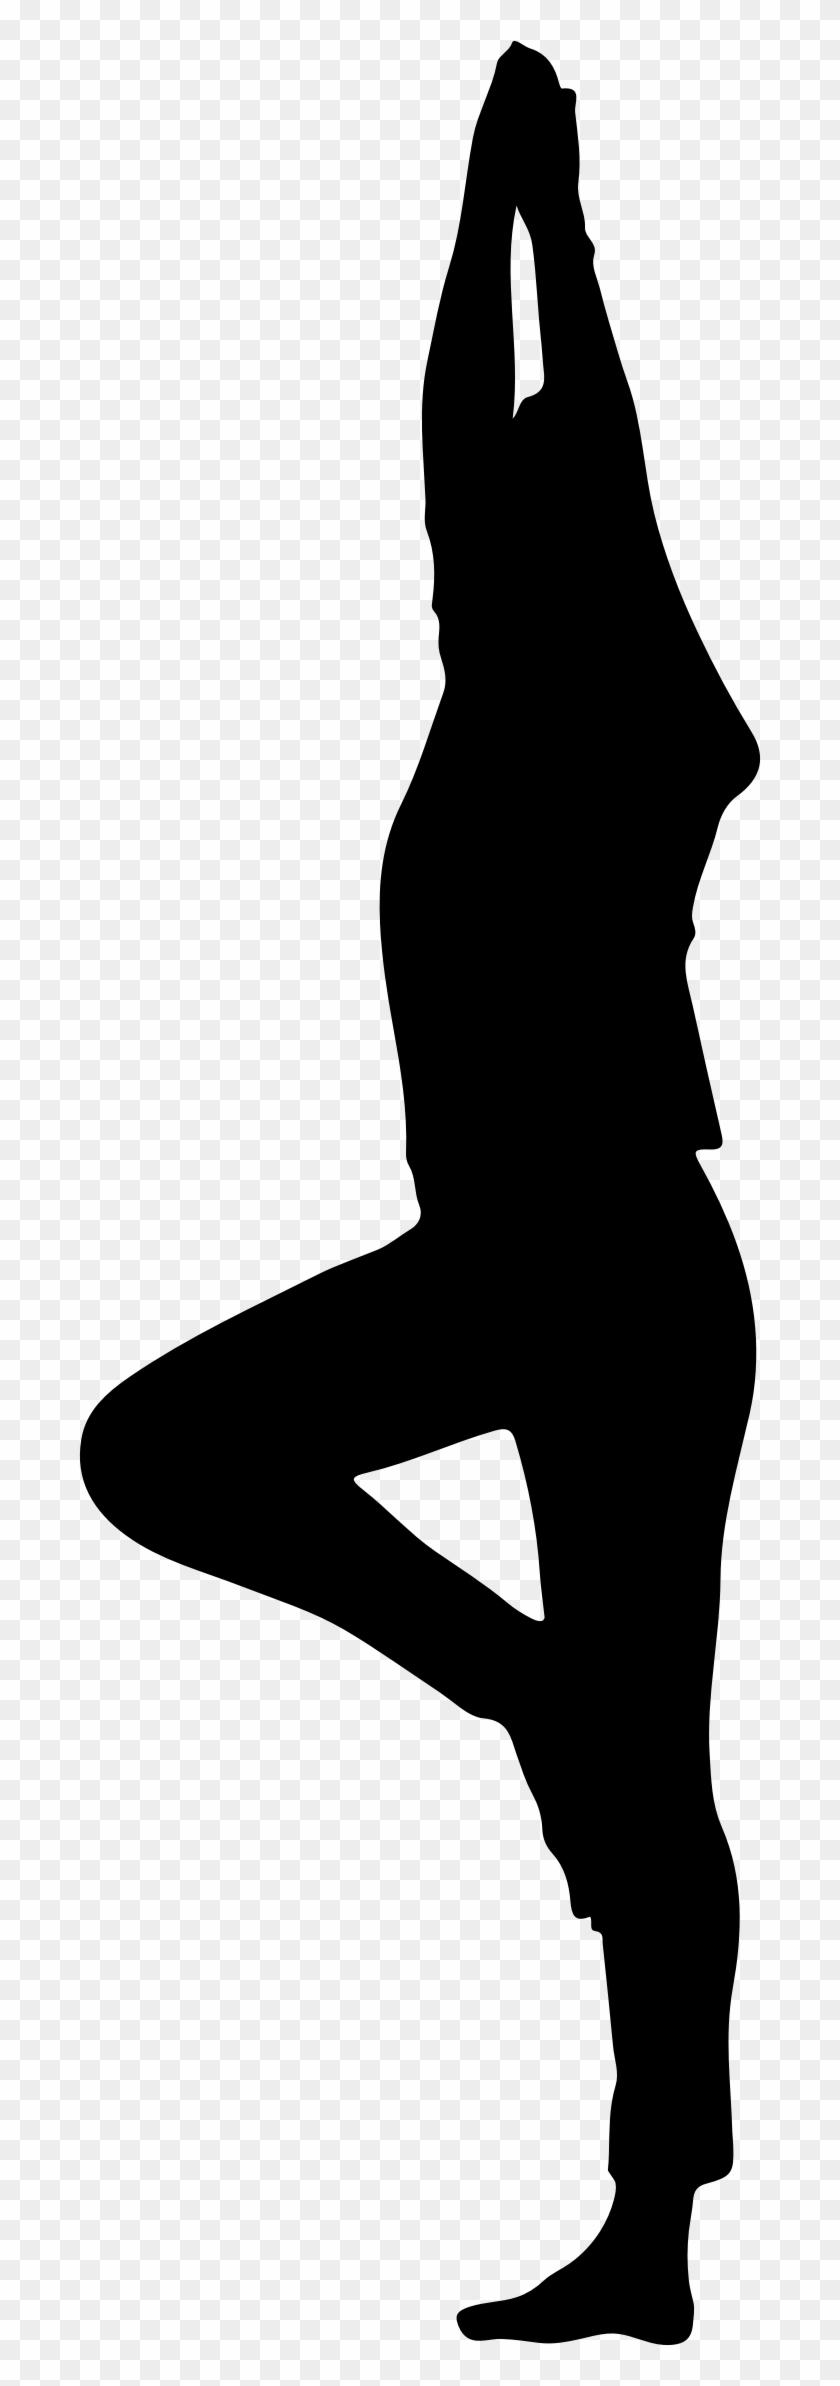 Yoga Pose Minus Ground Silhouette - Prenatal Yoga Clipart #64846